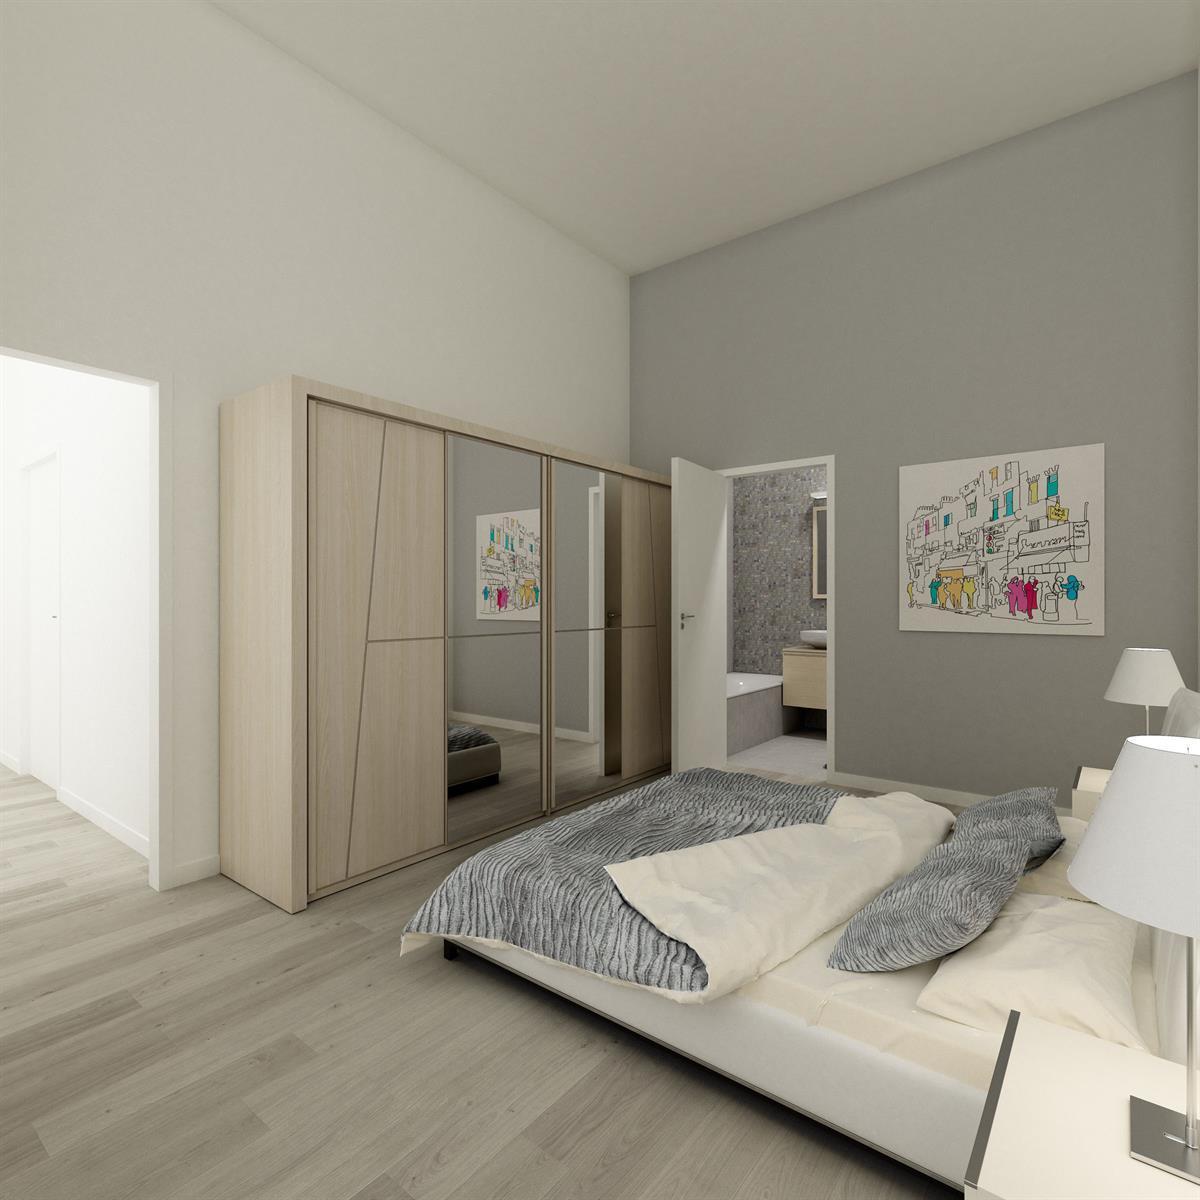 Studio - Saint-Gilles - #3999474-10